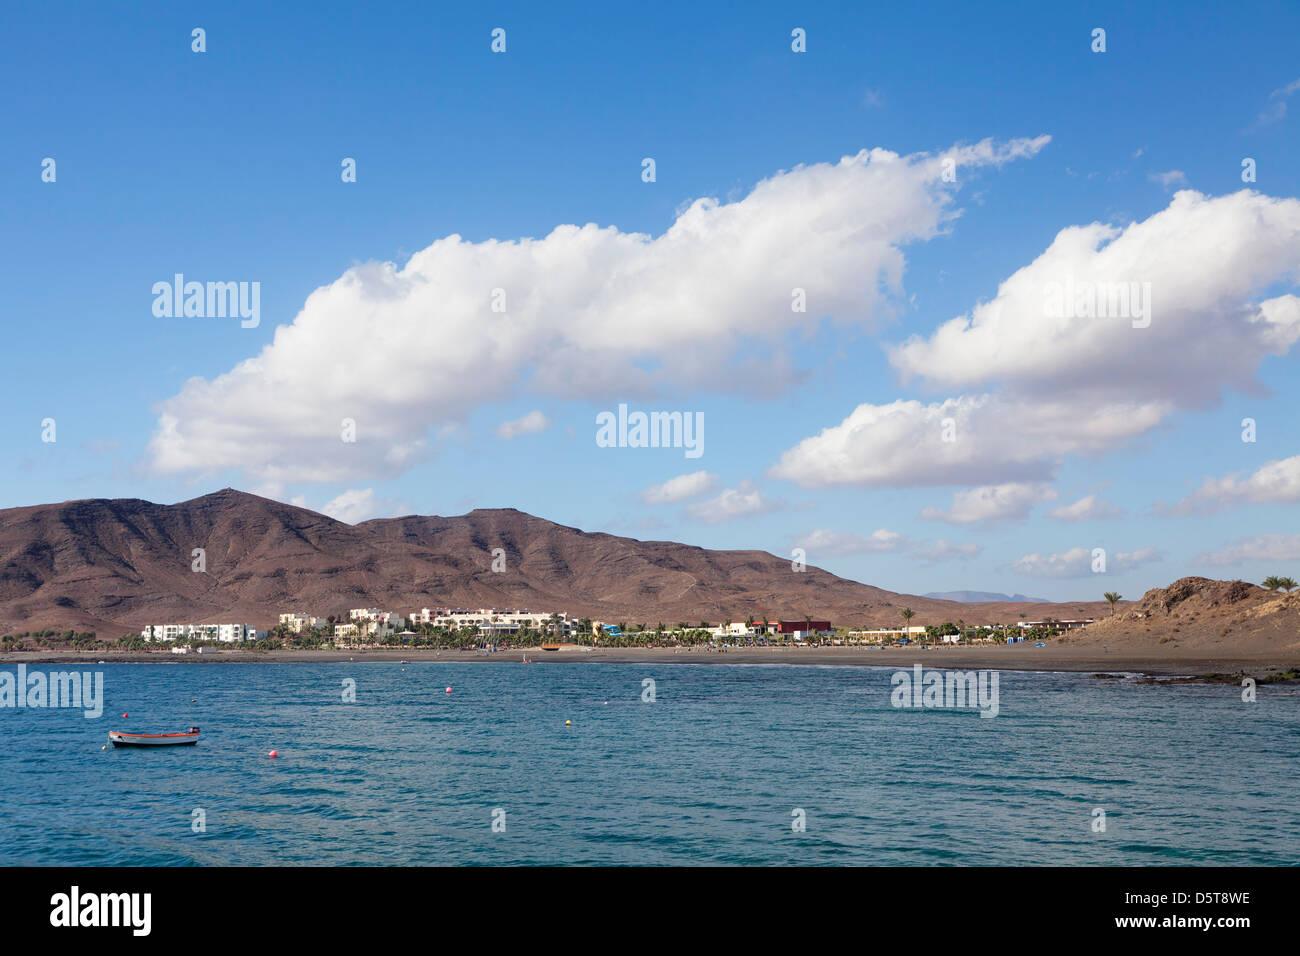 Bay of Las Playitas, Fuerteventura, Canary Islands, Spain Stock Photo